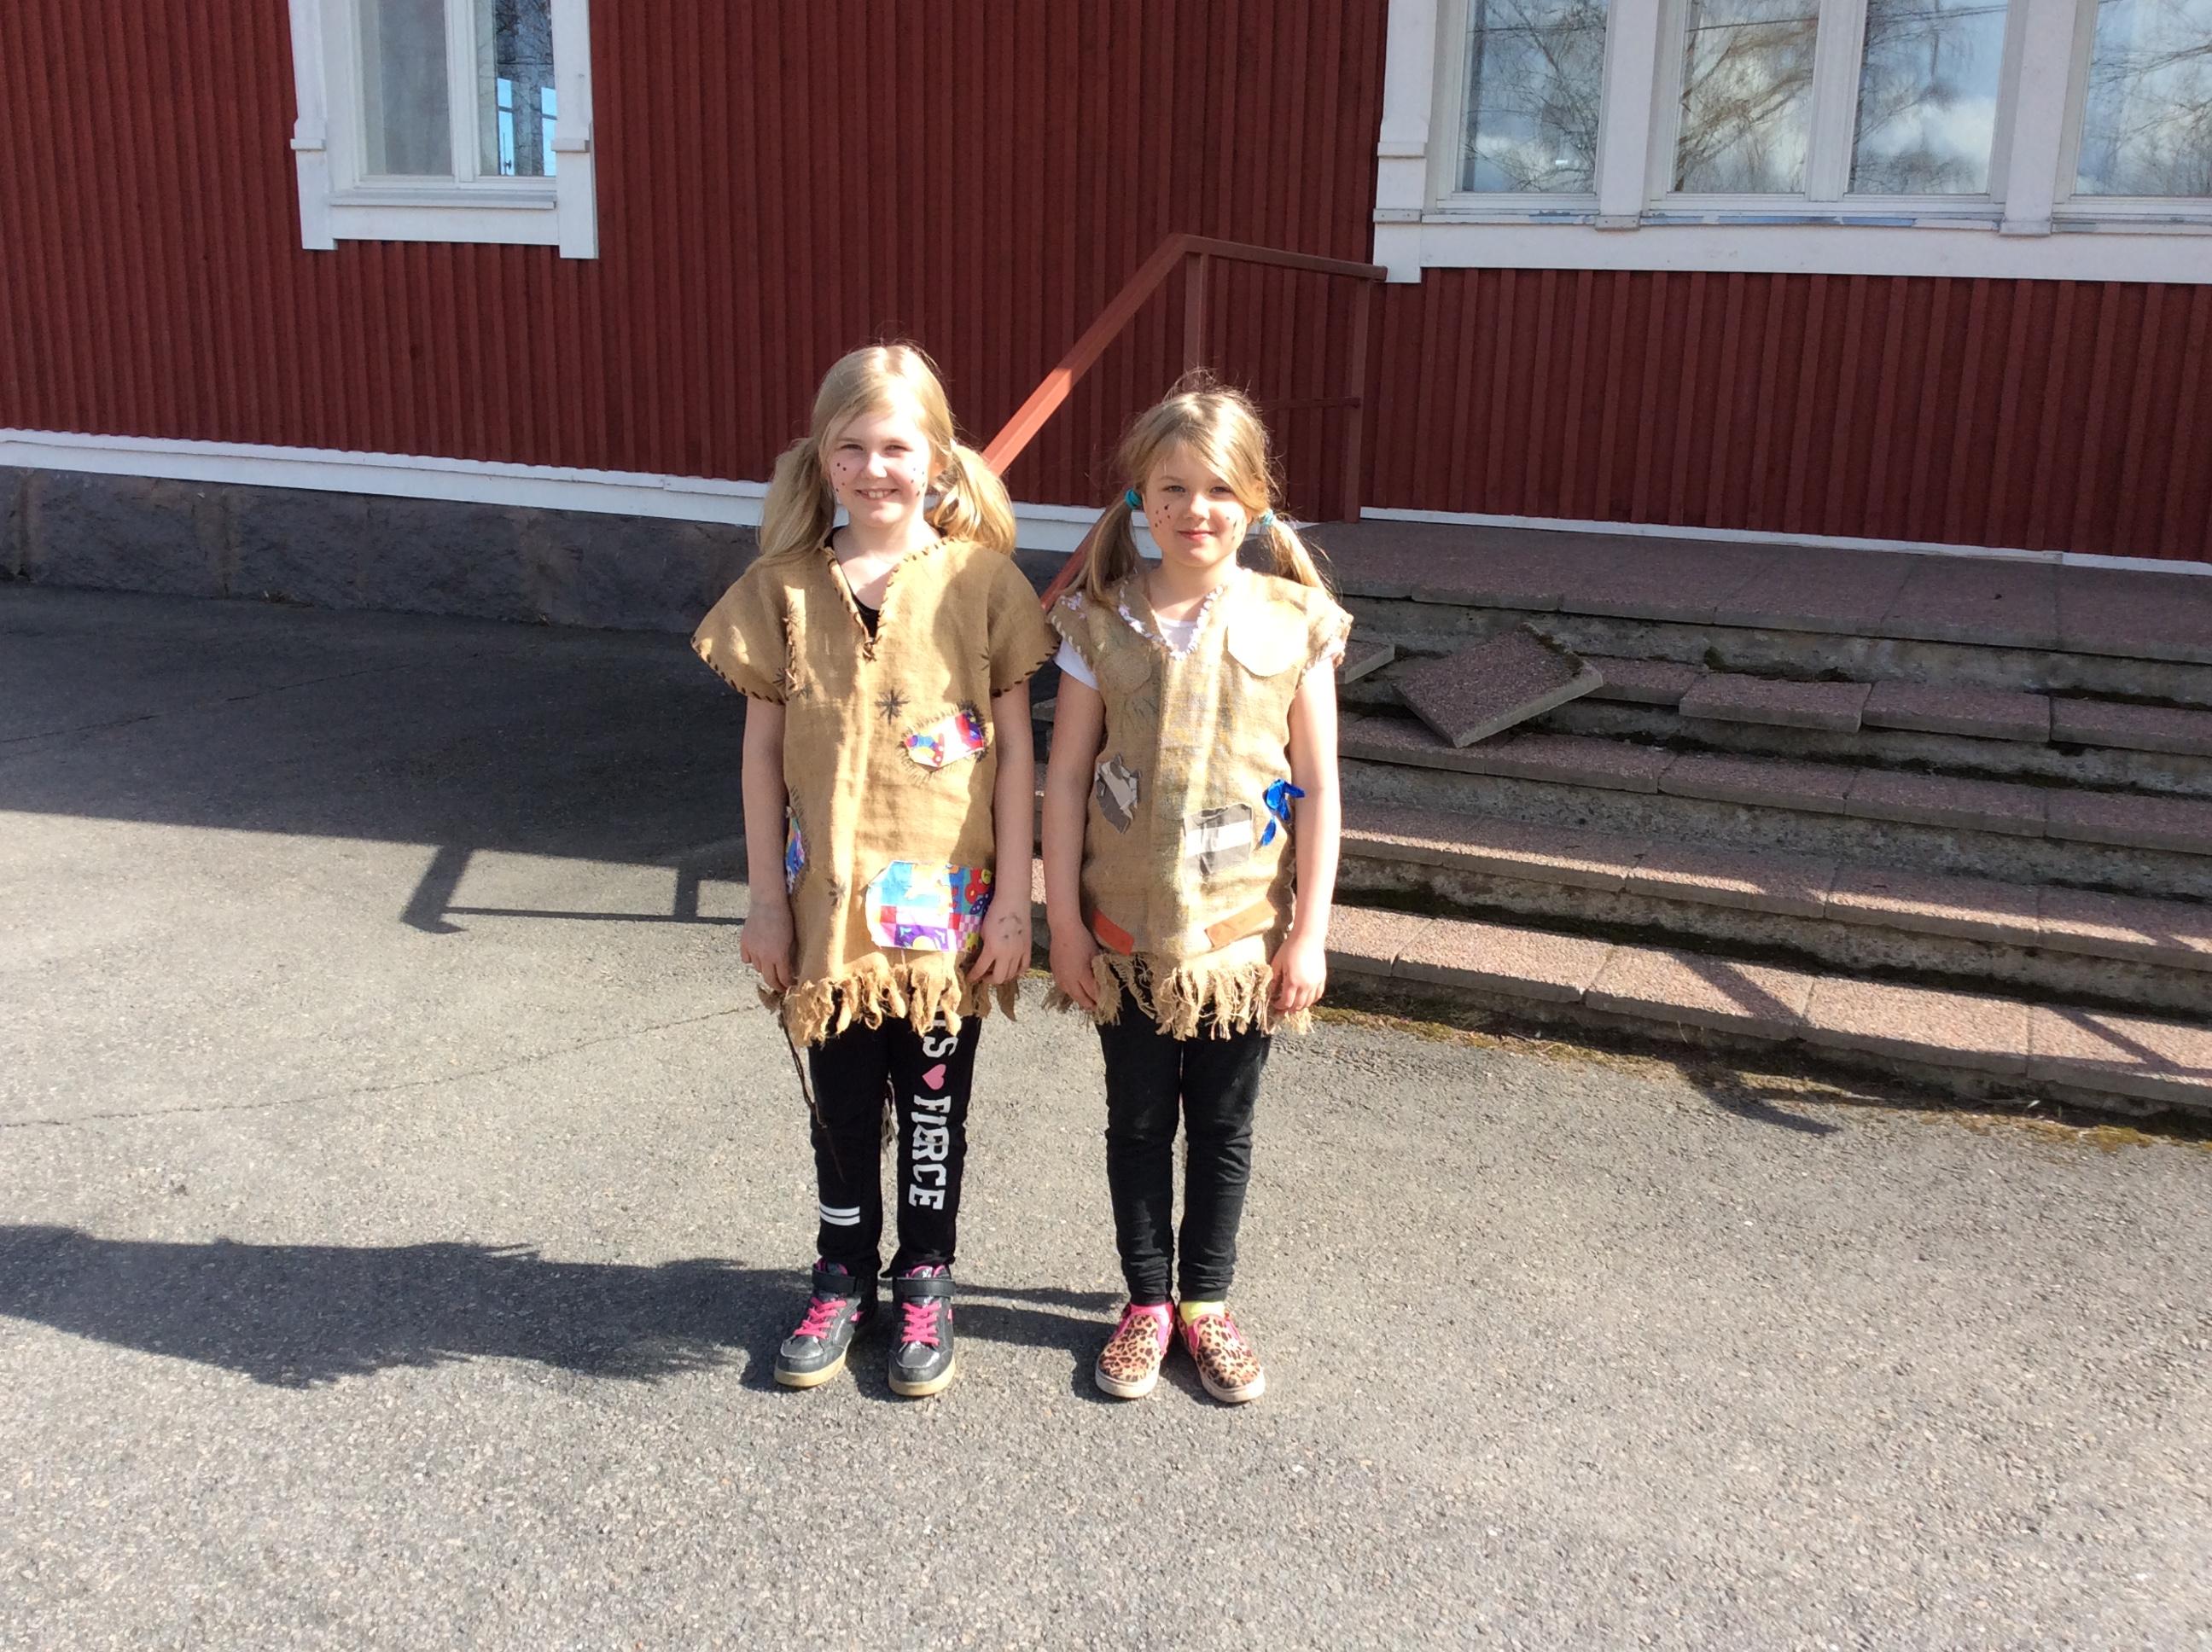 Jäppilän koulun vappukarkelot